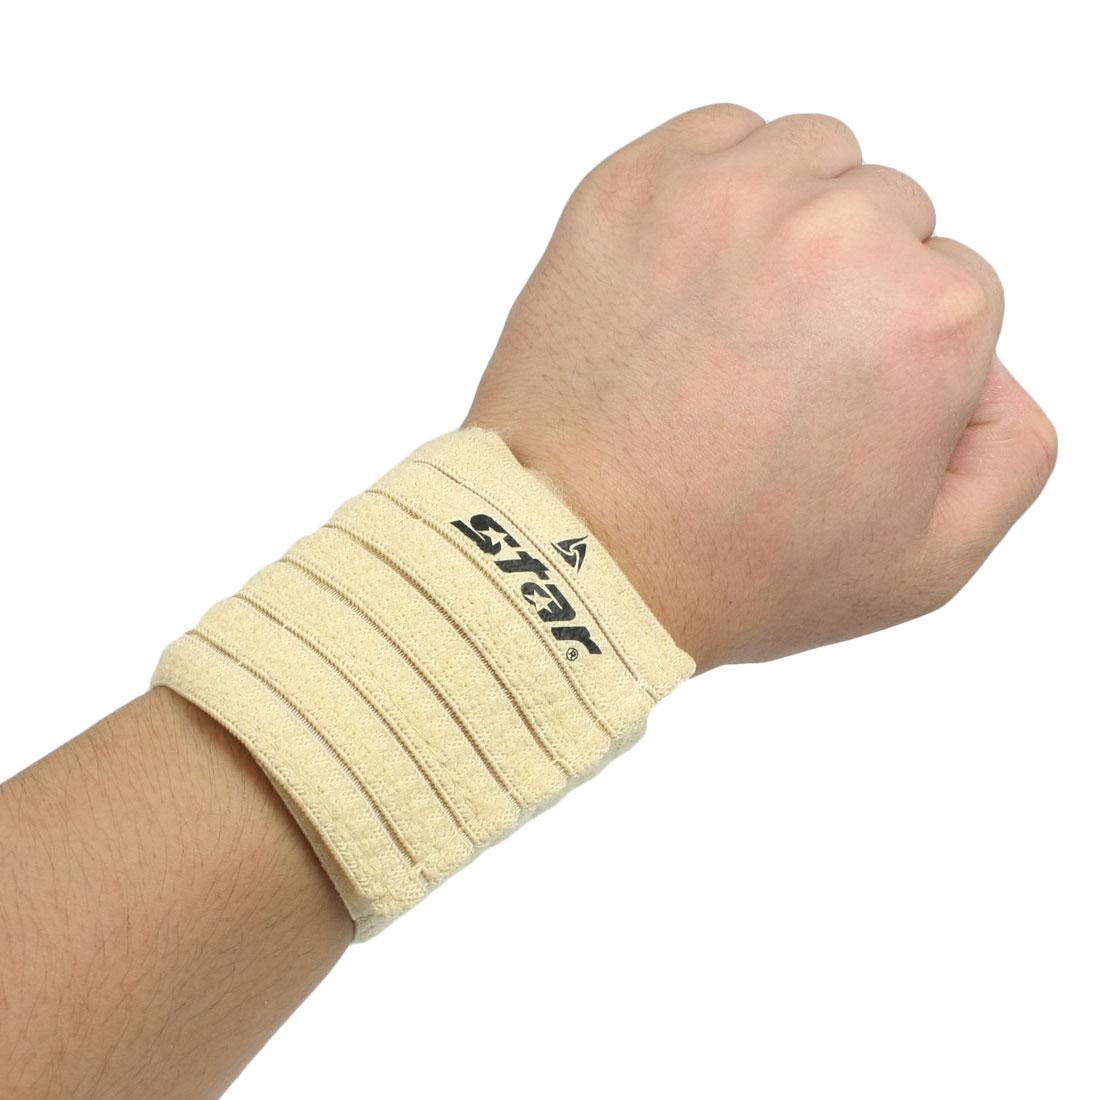 Sporter Athlete Hook Loop Elastic Sports Wrist Support Beige